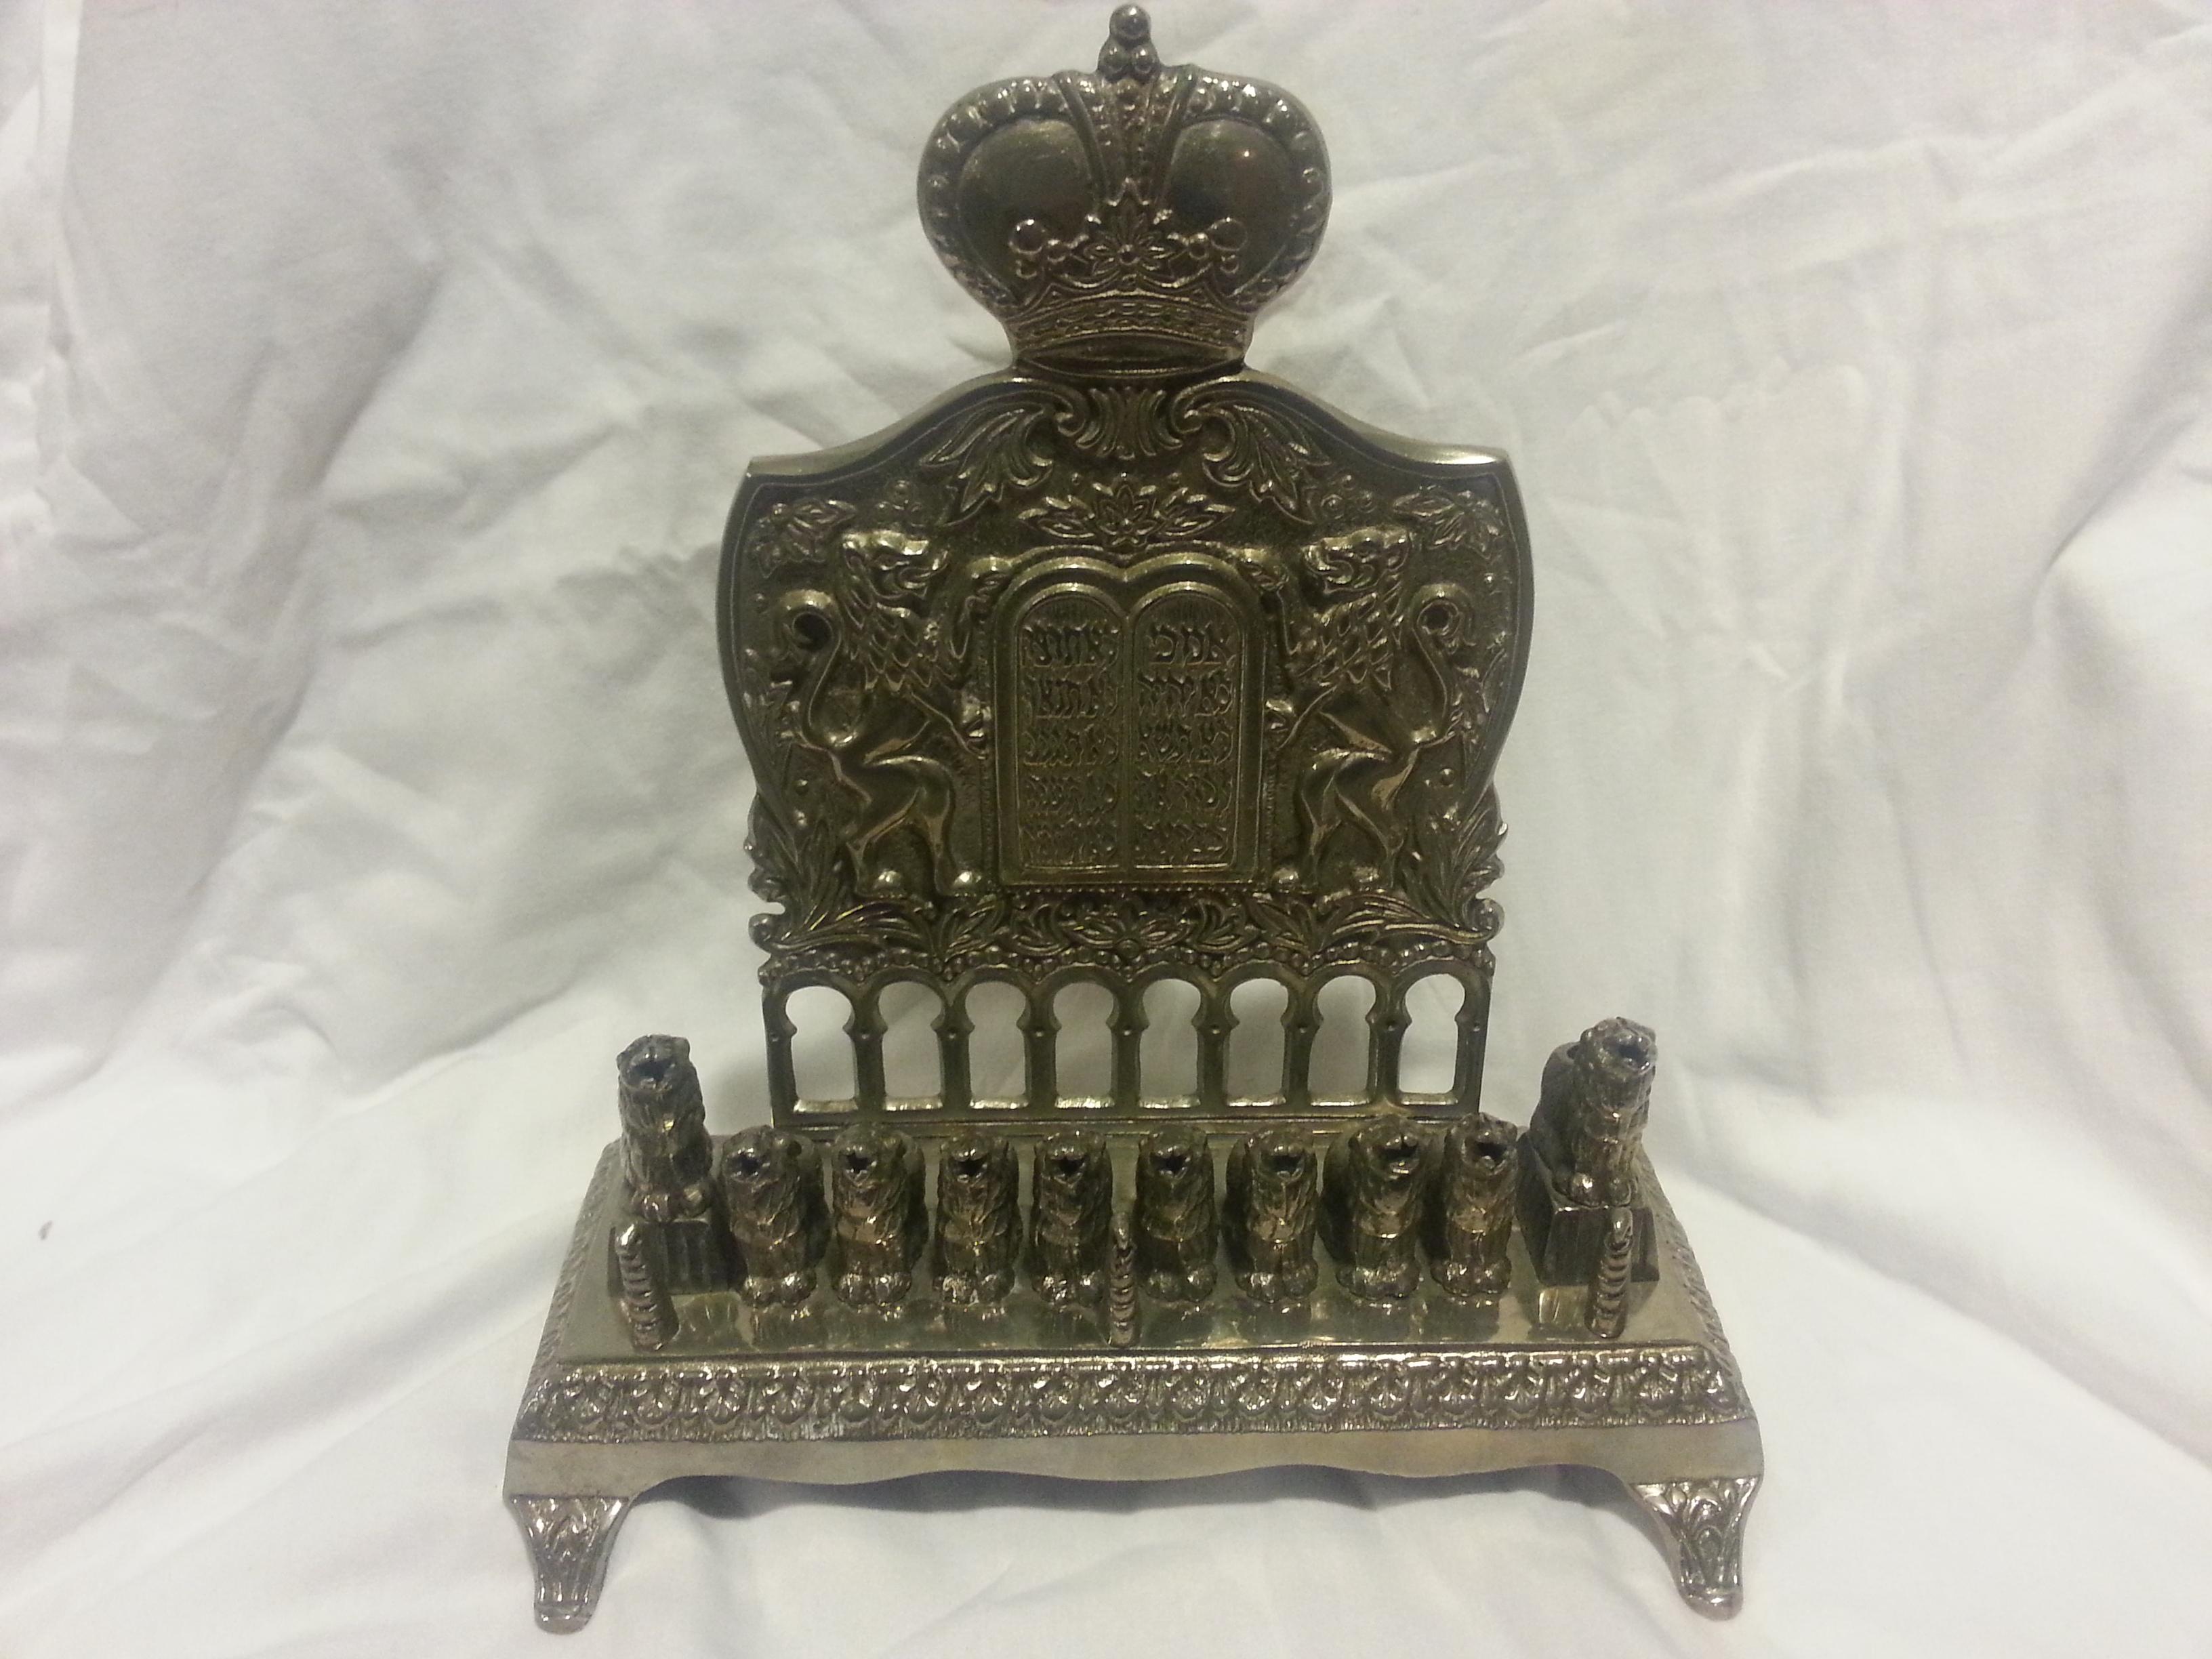 Antique menorah interest money value bit collecting for Antique items worth a lot of money